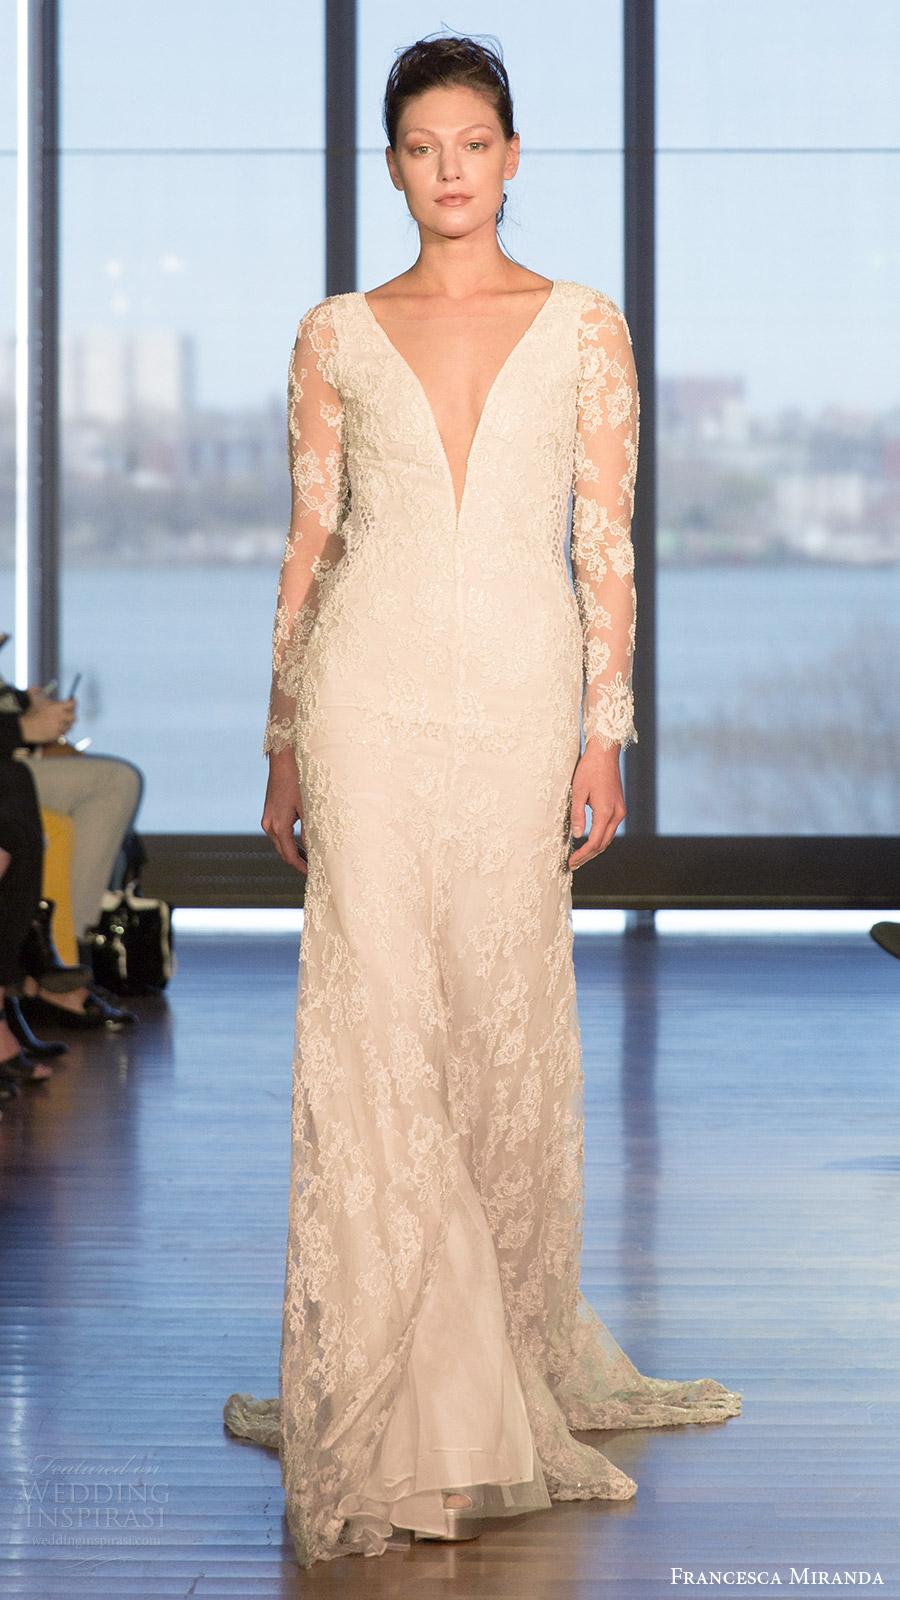 Wedding Dresses With Lace Sleeves 2017 : Francesca miranda spring wedding dresses inspirasi